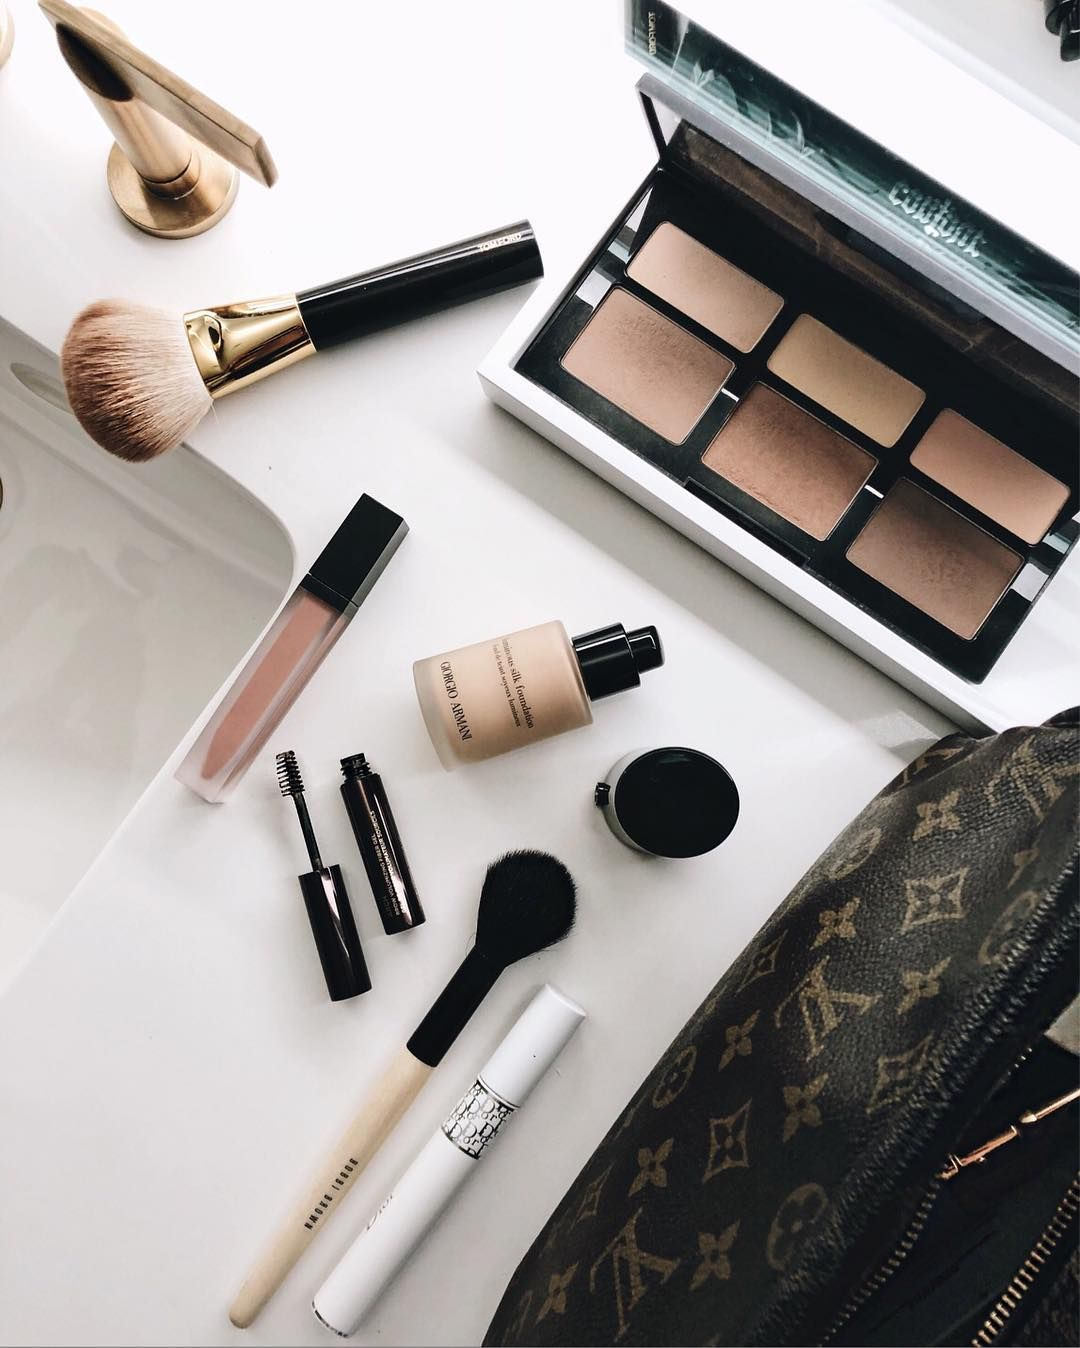 happily // Armani makeup, Beauty, Beauty foundation